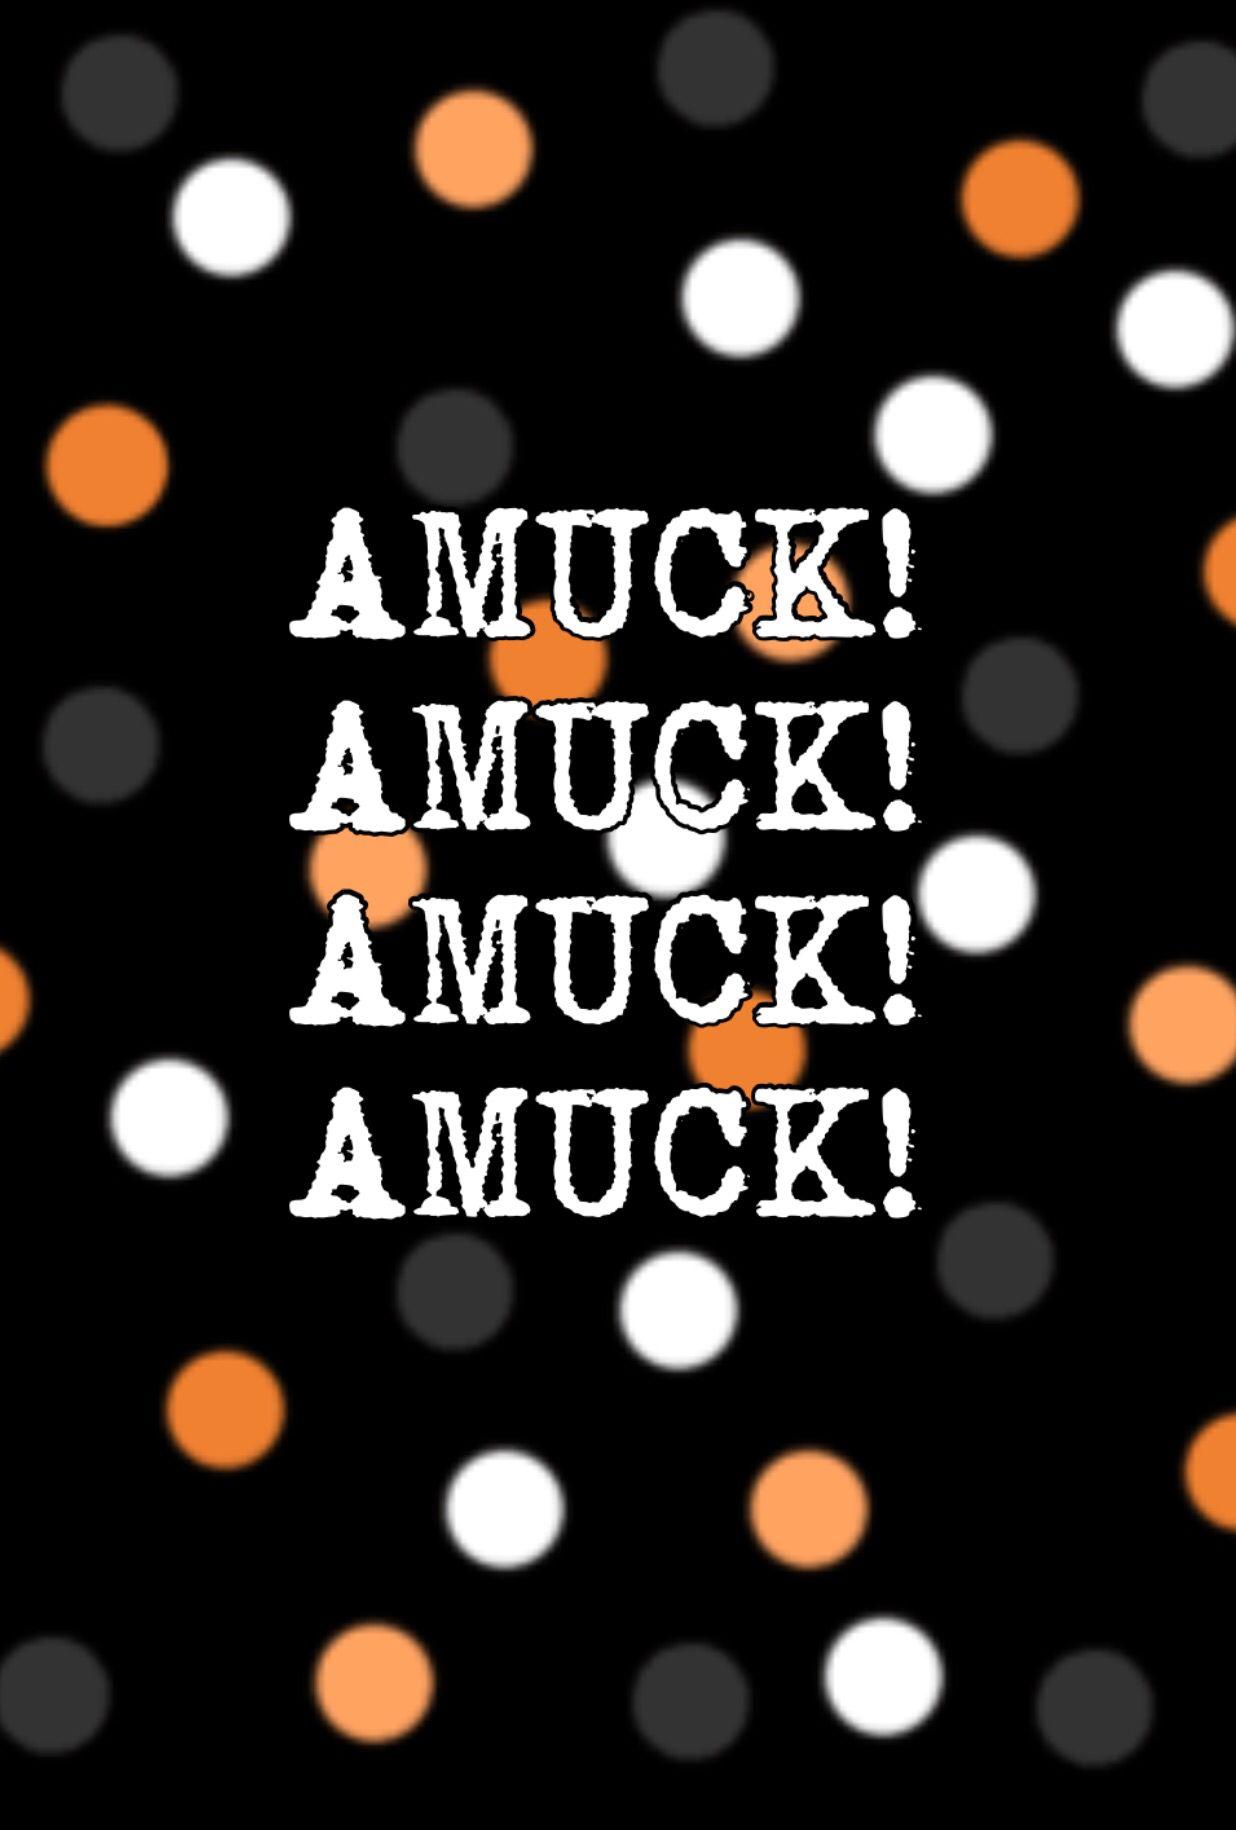 Amuck Amuck Amuck Super Cute Hocus Pocus Inspired Iphone Wallpaper Great For Getti Thanksgiving Iphone Wallpaper Thanksgiving Wallpaper Halloween Wallpaper